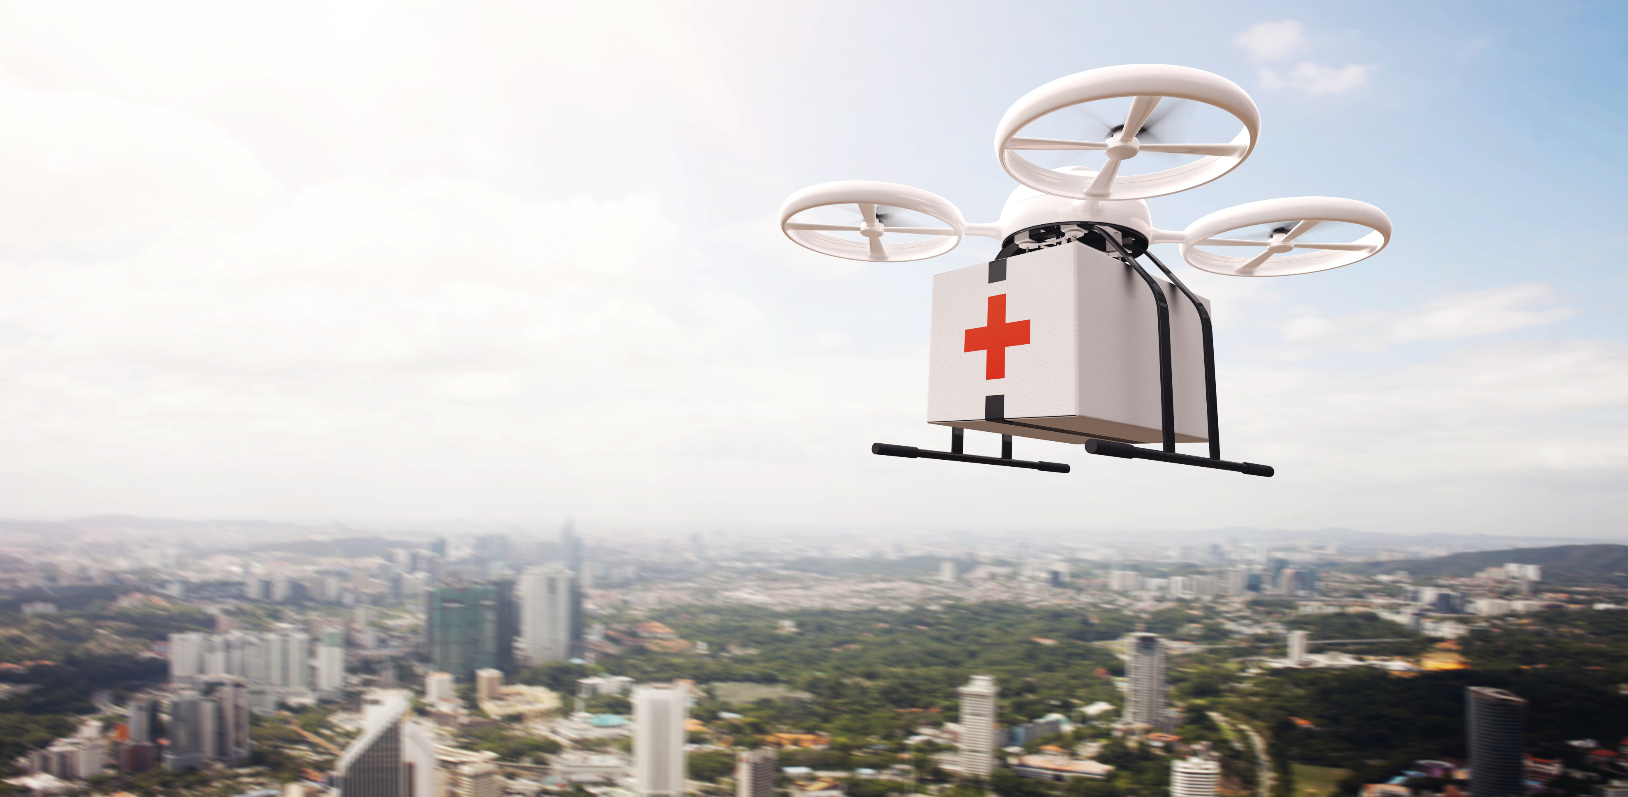 Emergency response drone